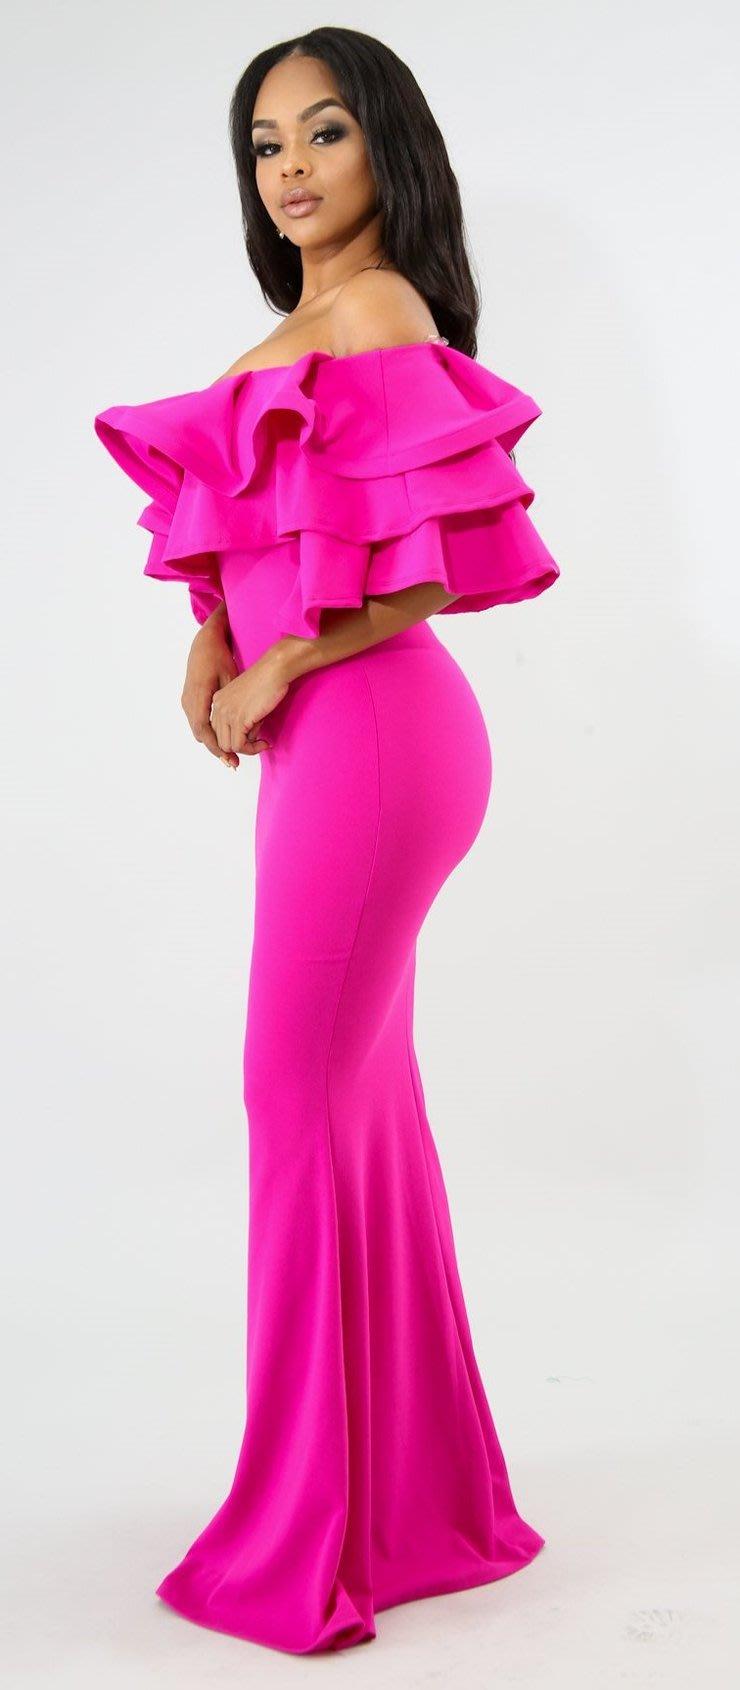 275641e03bf Formal Dresses - Fuchsia Maxi Off Shoulder Ruffles Evening Mermaid ...